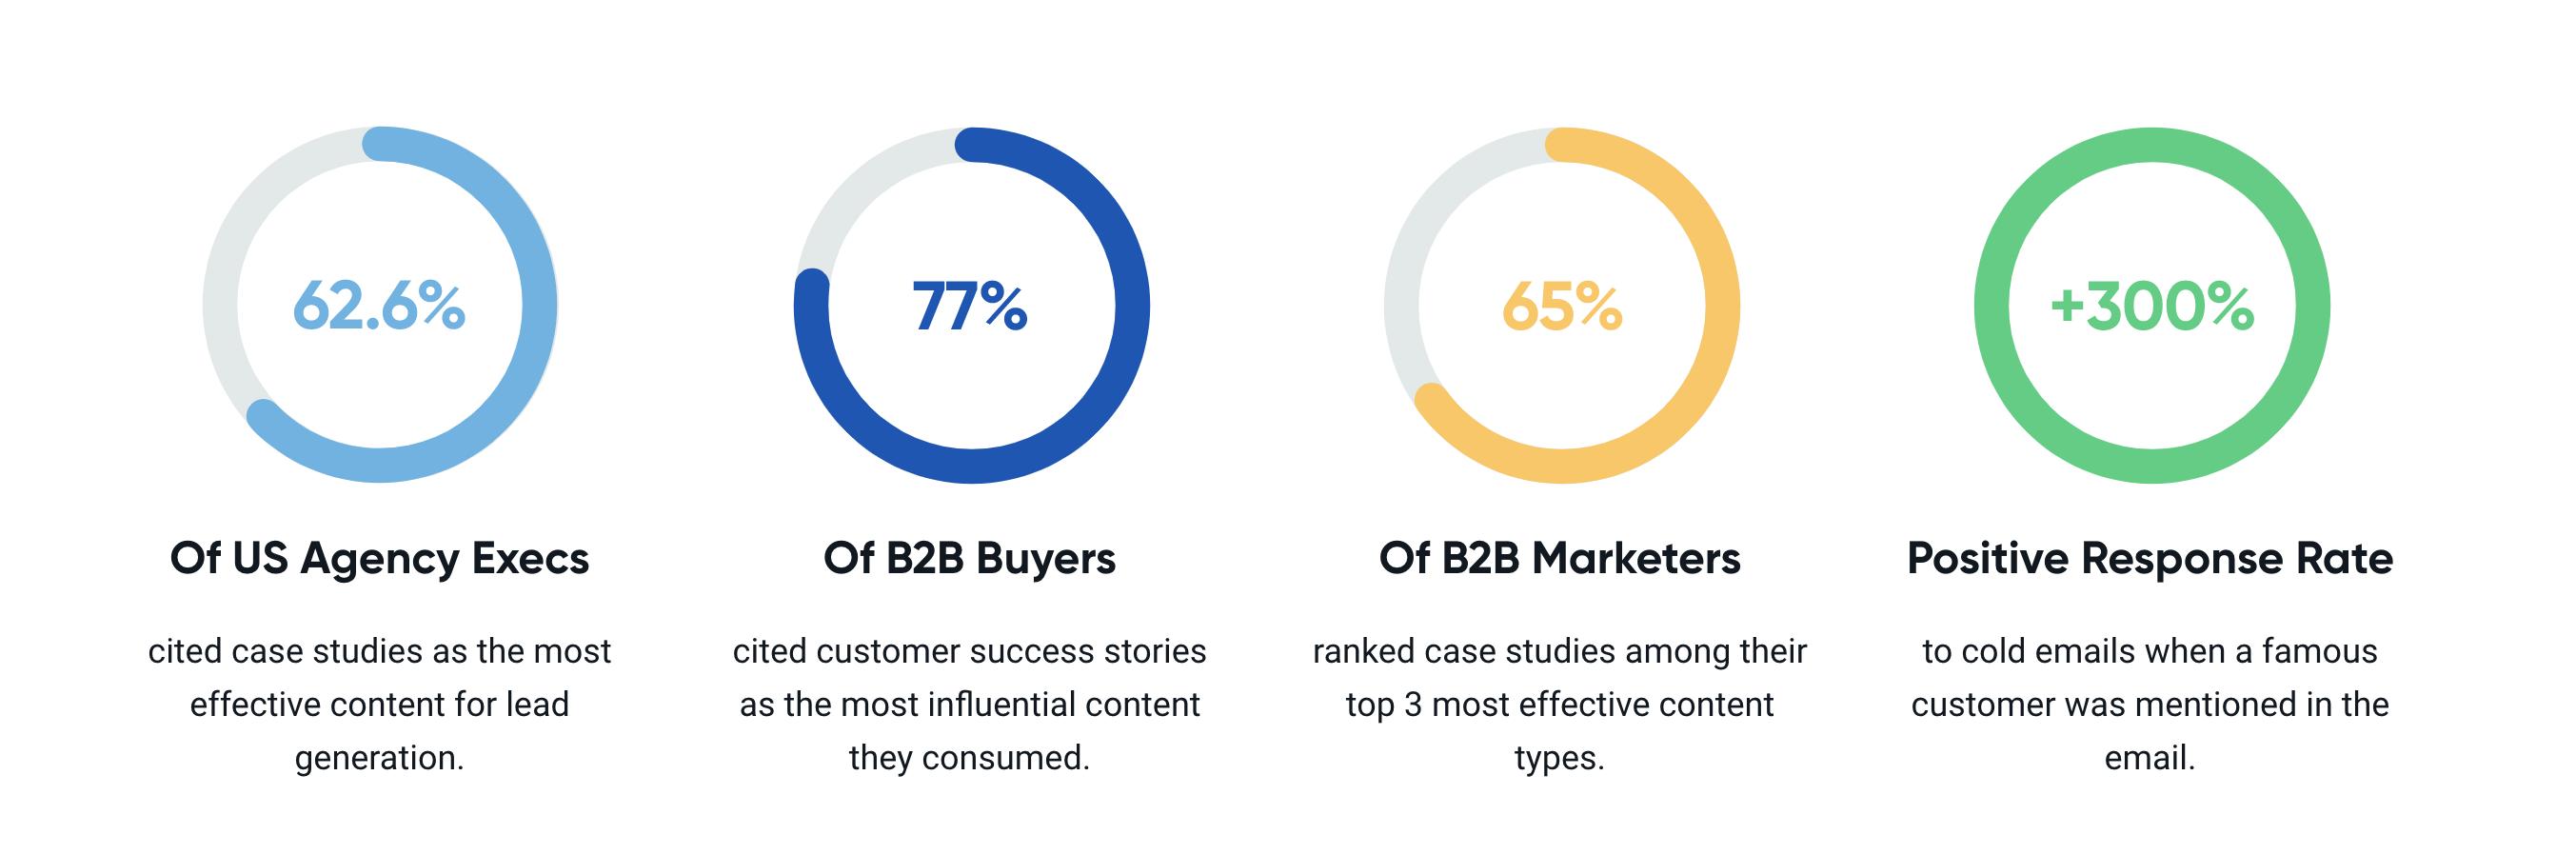 case study buddy B2B data screenshot